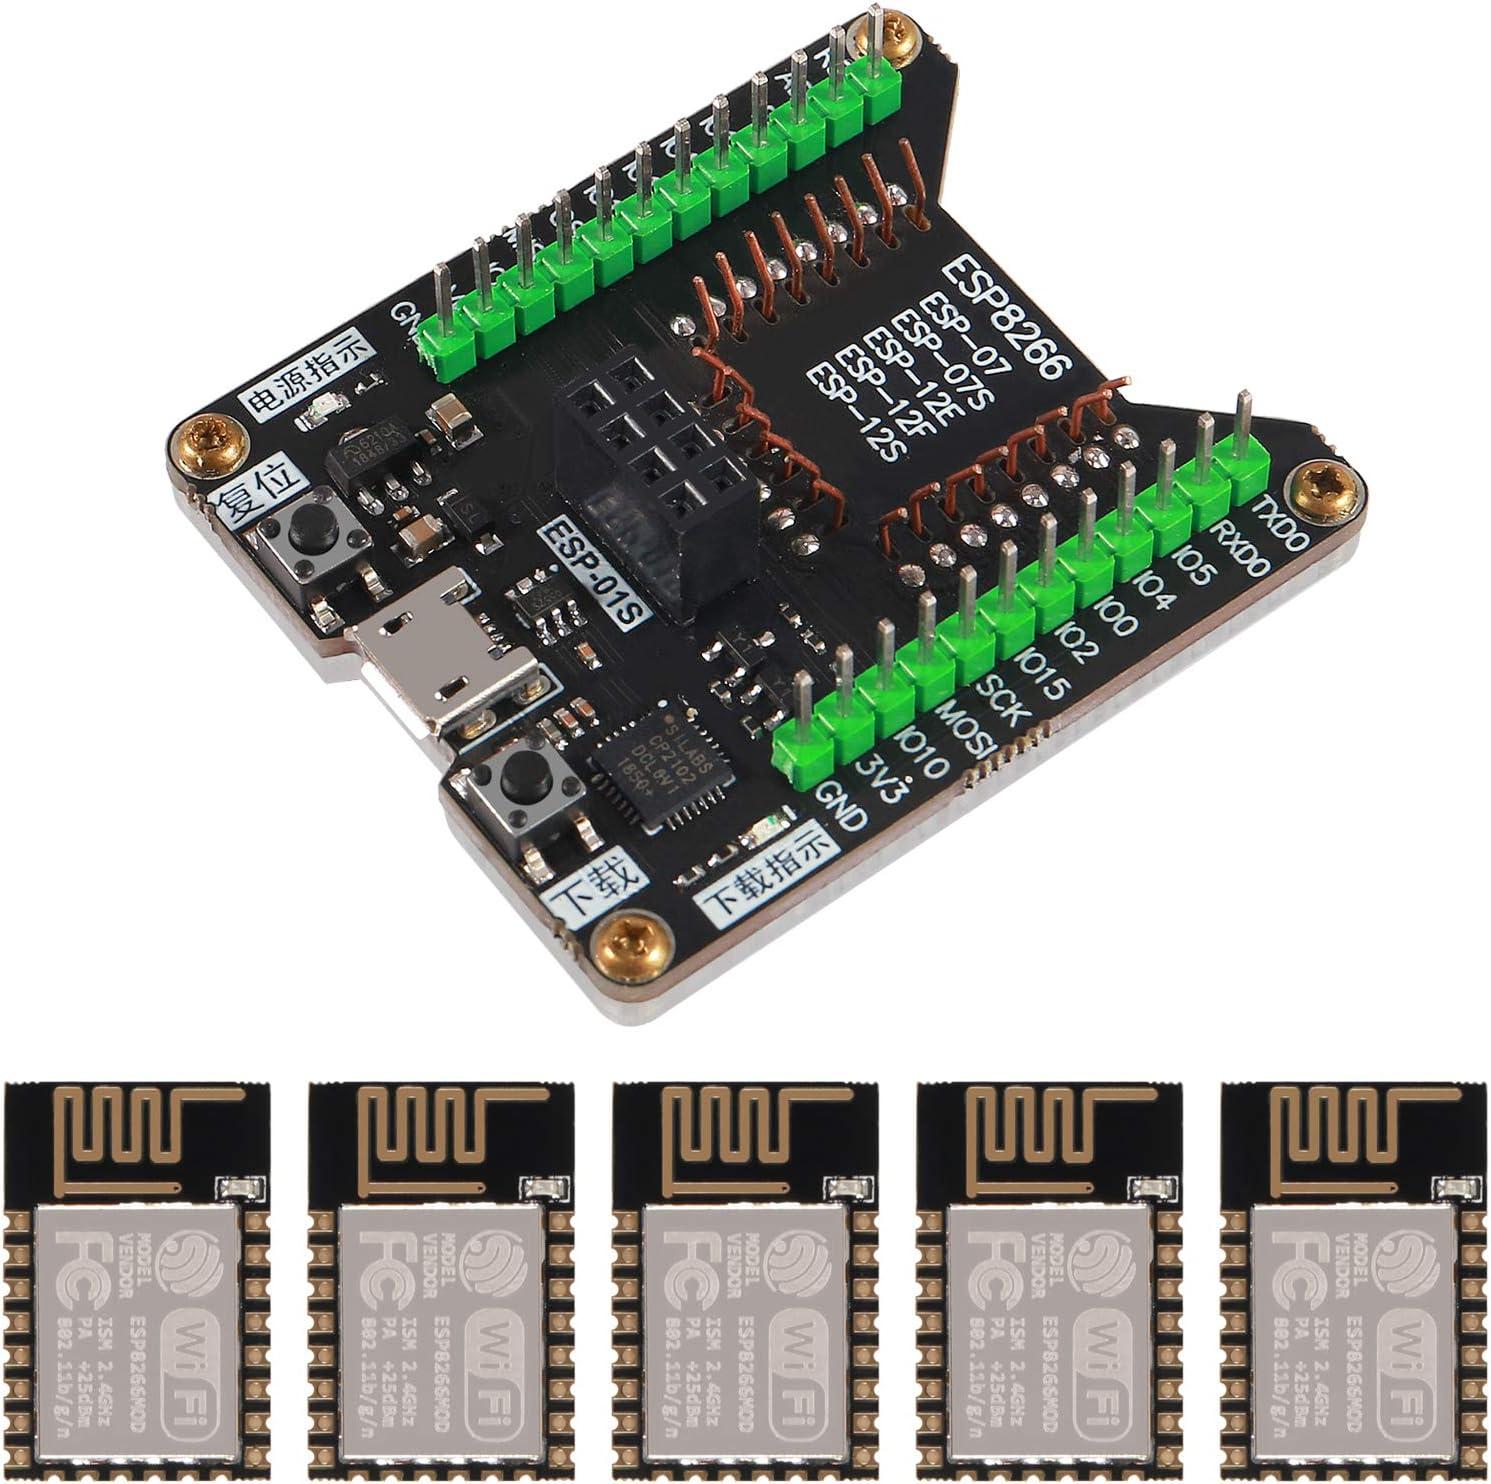 DORHEA ESP8266 Code NEW before selling ☆ Burner Firmware To Download Gorgeous Flash Downloader